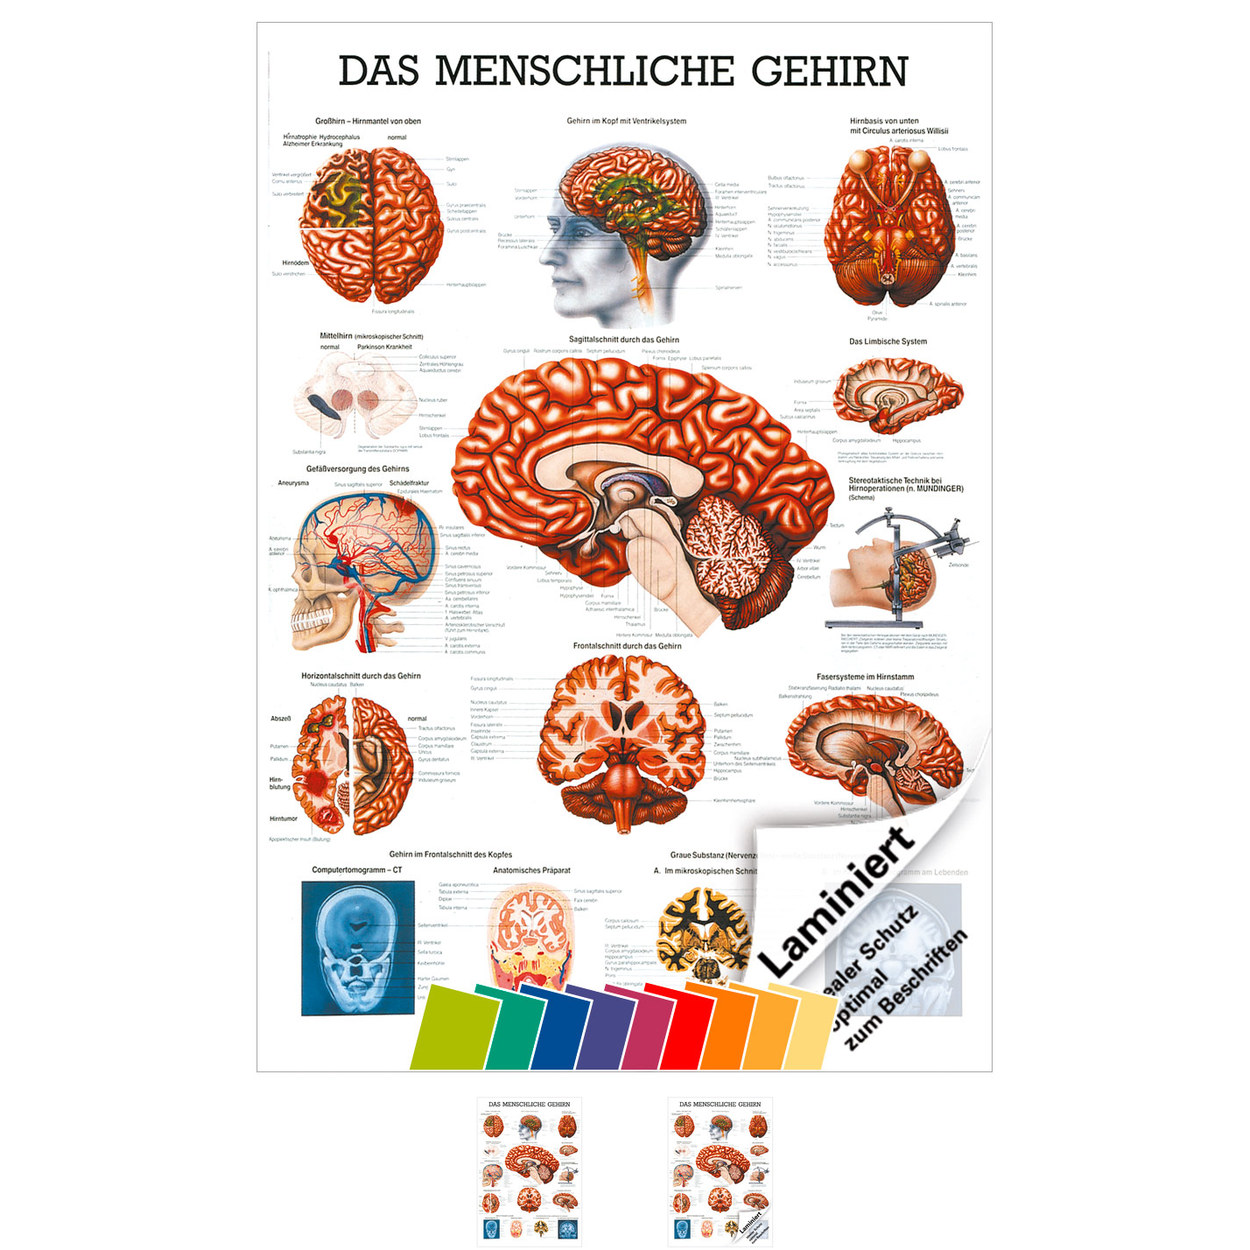 Gehirn Mini-Poster Anatomie 34x24 cm medizinische Lehrmittel | eBay